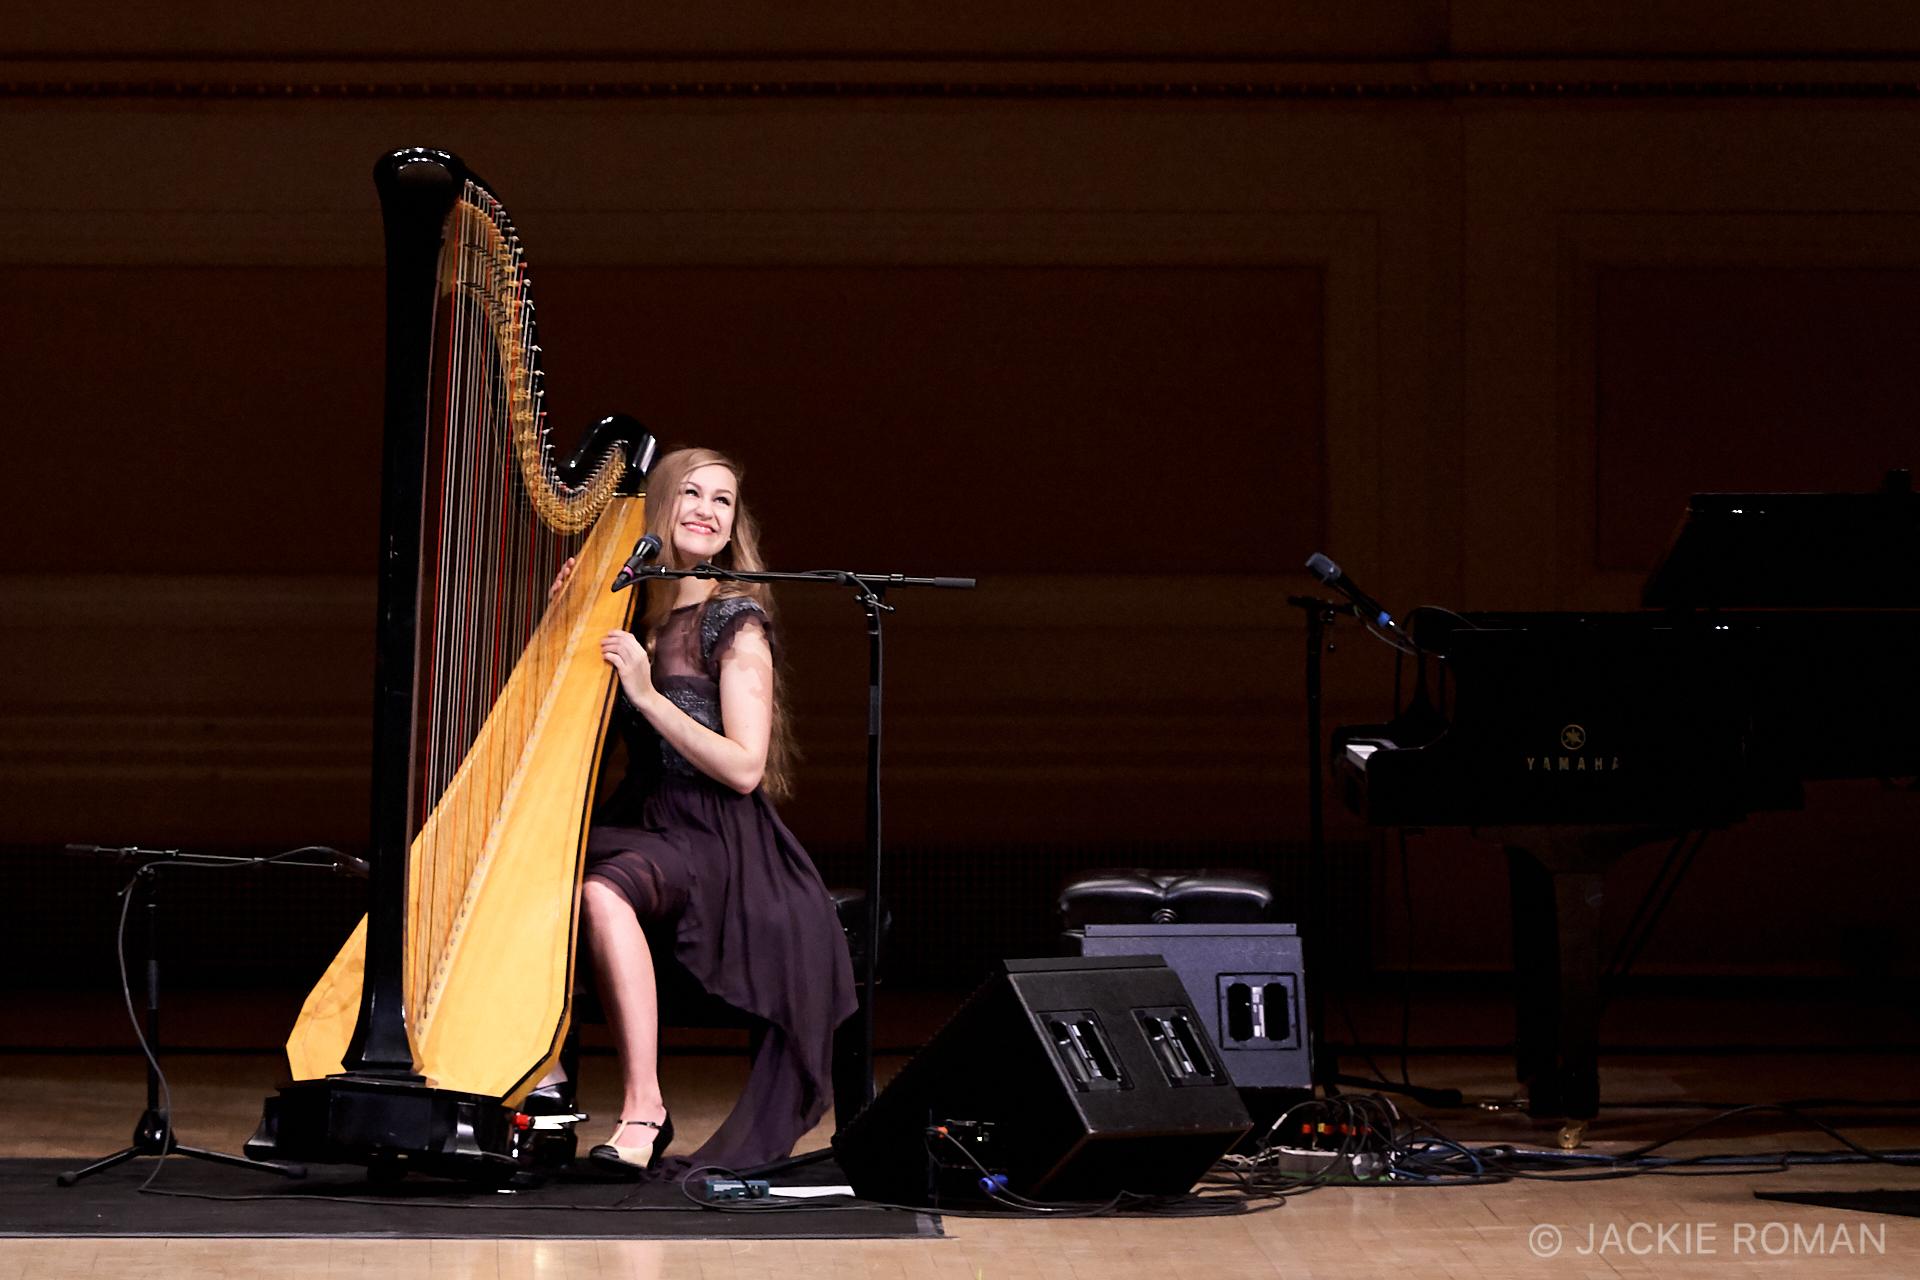 Joanna Newsom Concert at Carnegie Hall, New York,November 23, 2010.